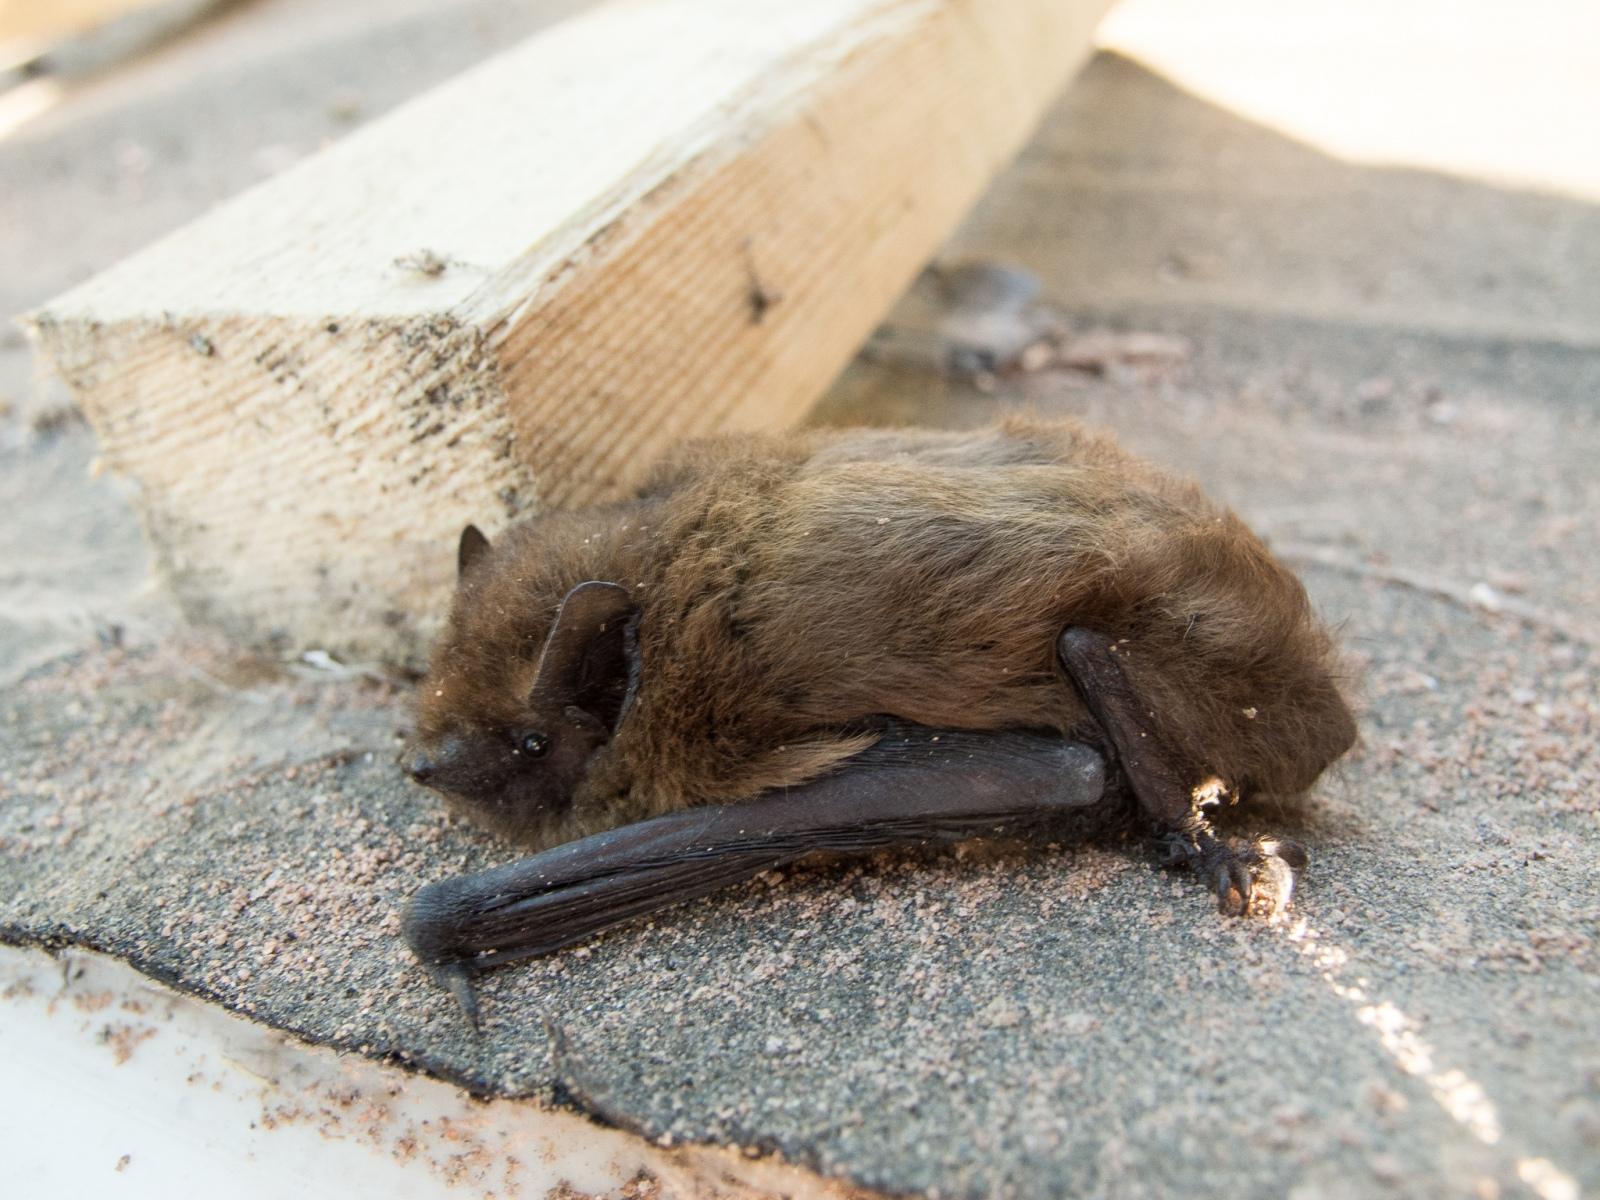 Pipistrellus pipistrellus - Common Pipistrelles